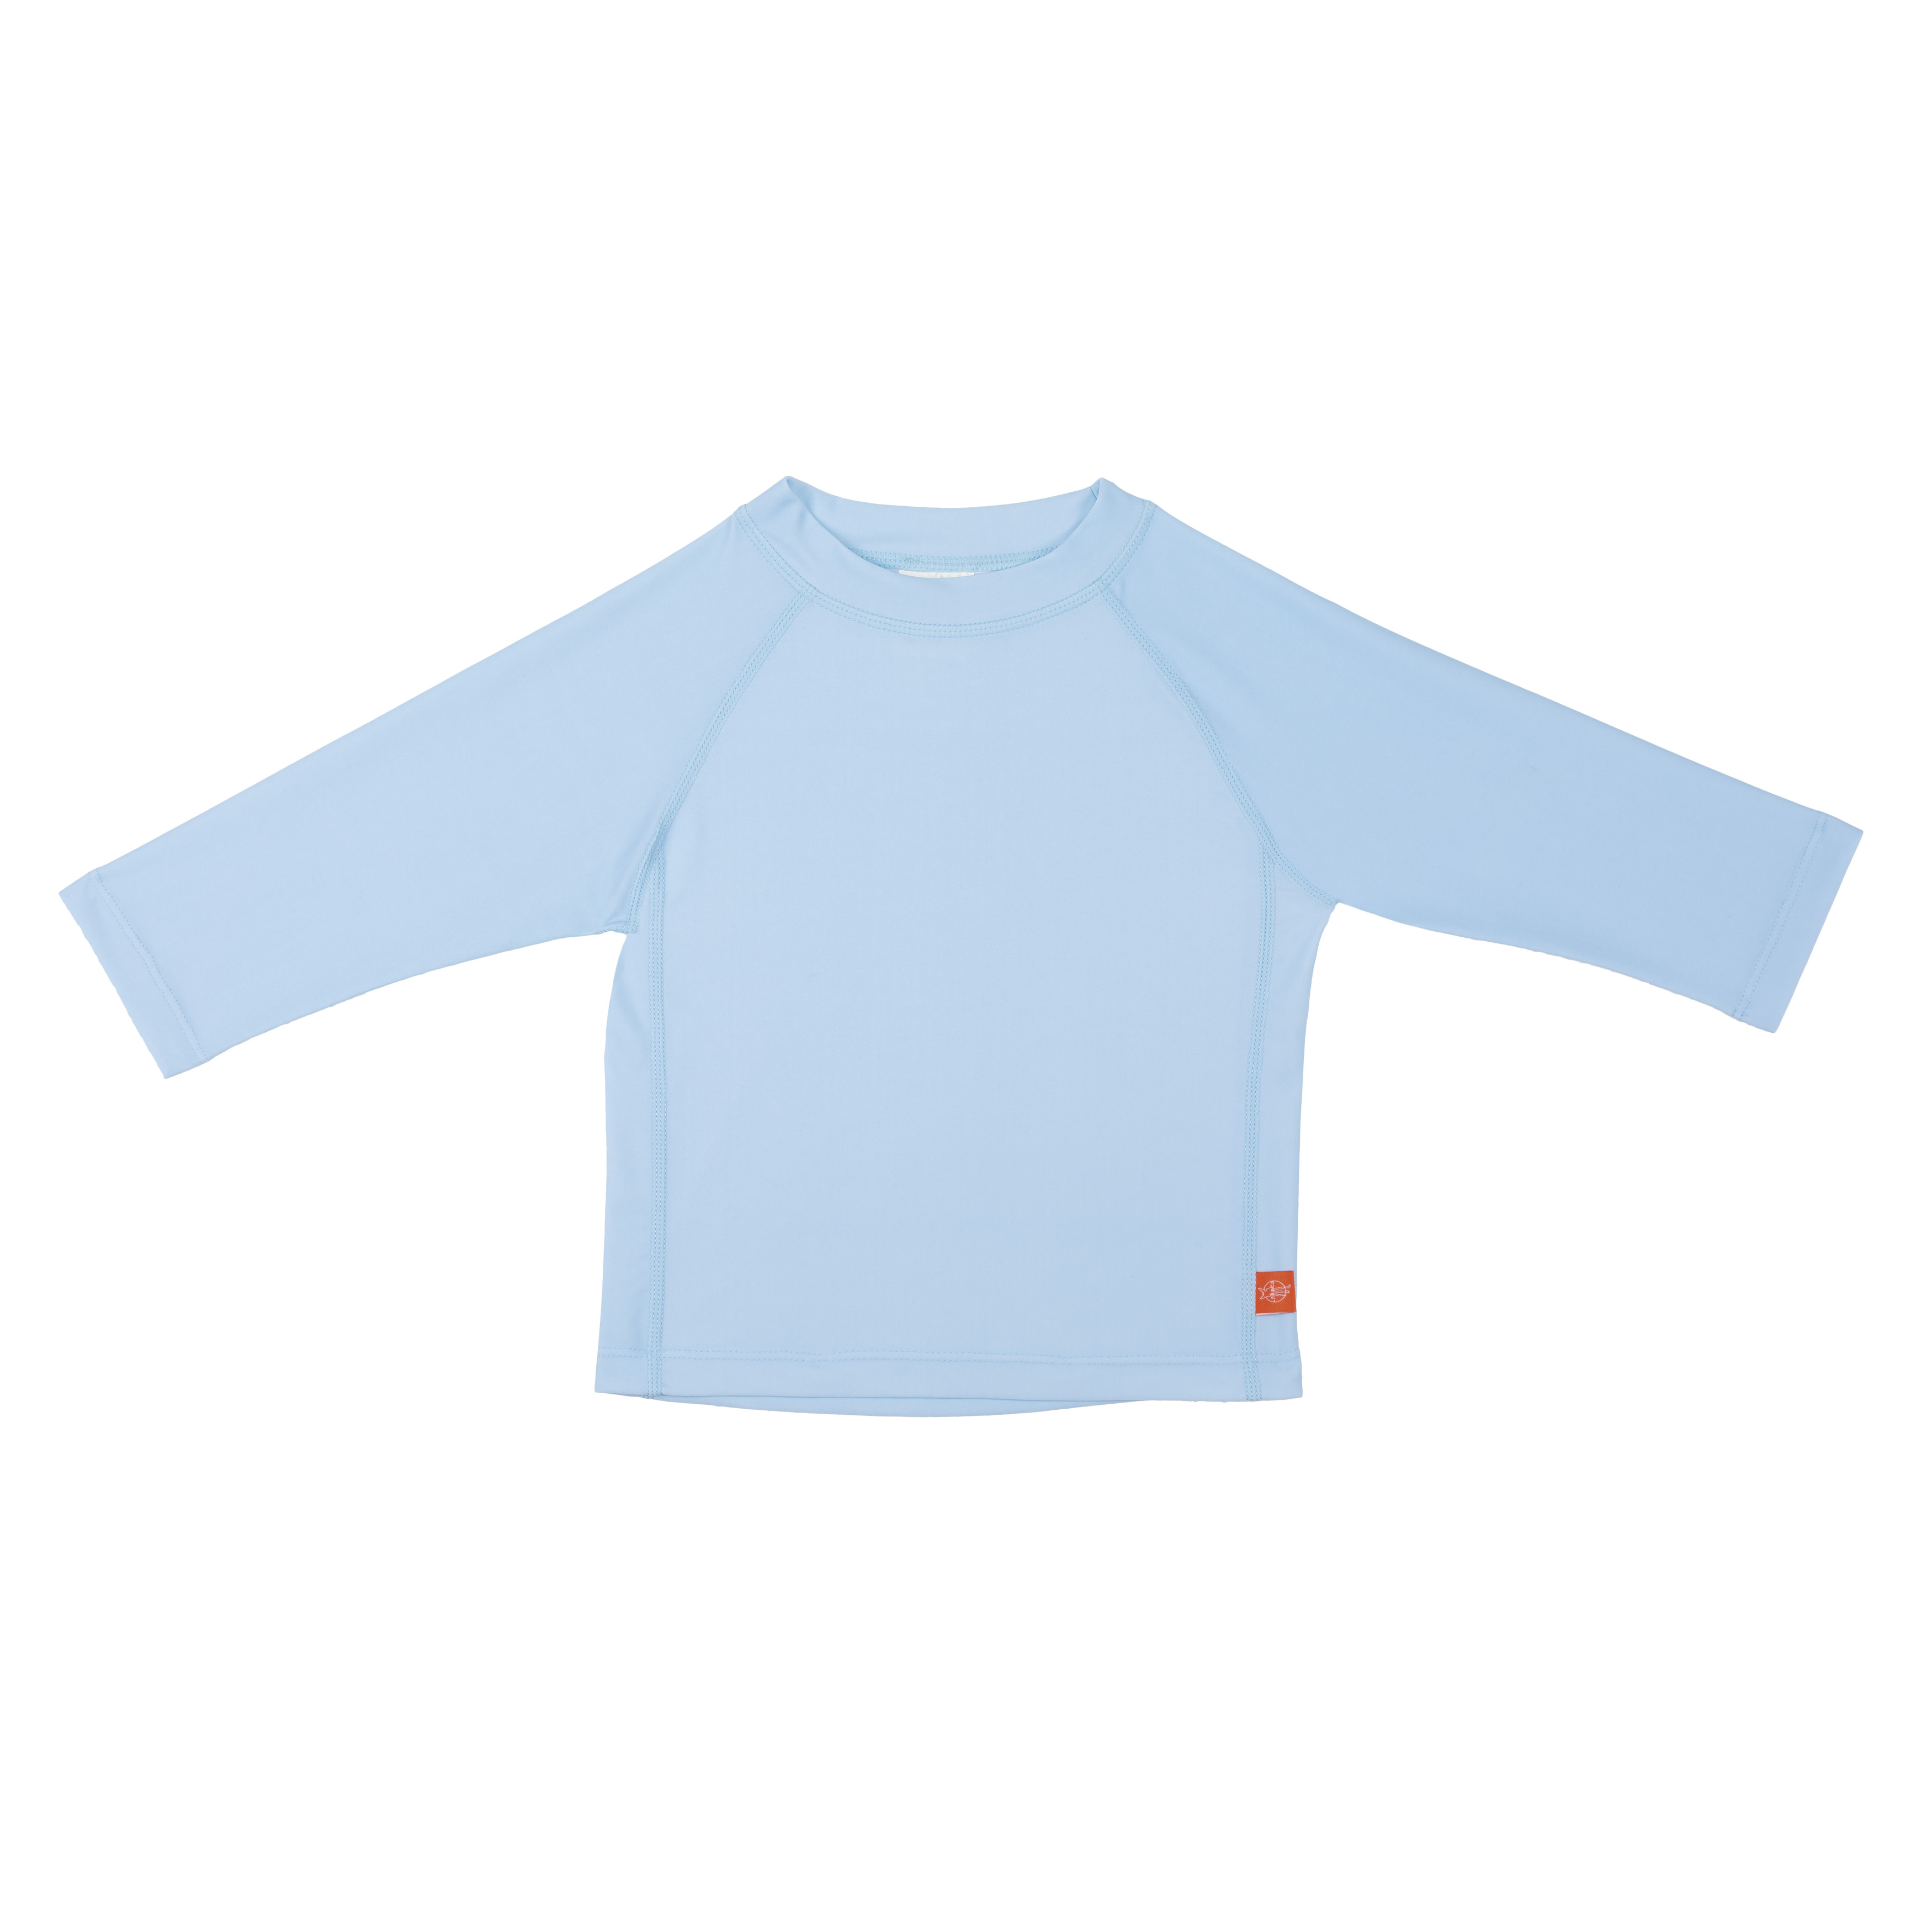 långärmad uv tröja